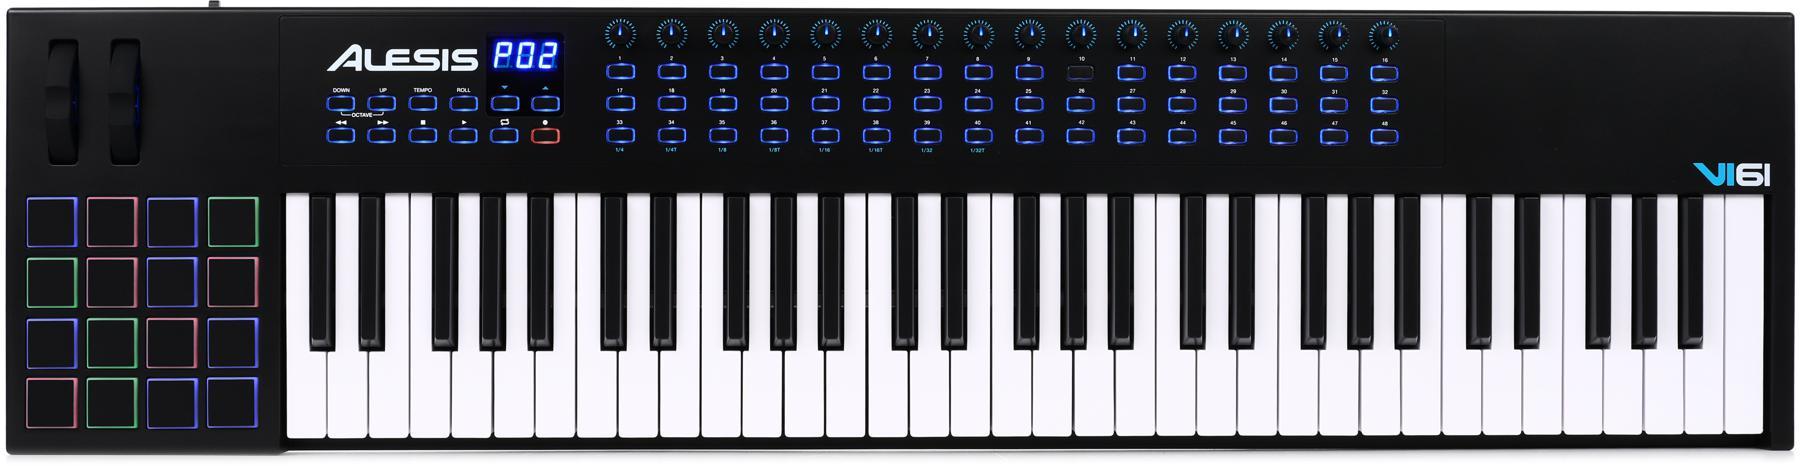 7. Alesis VI61 | 61-Key USB MIDI Keyboard